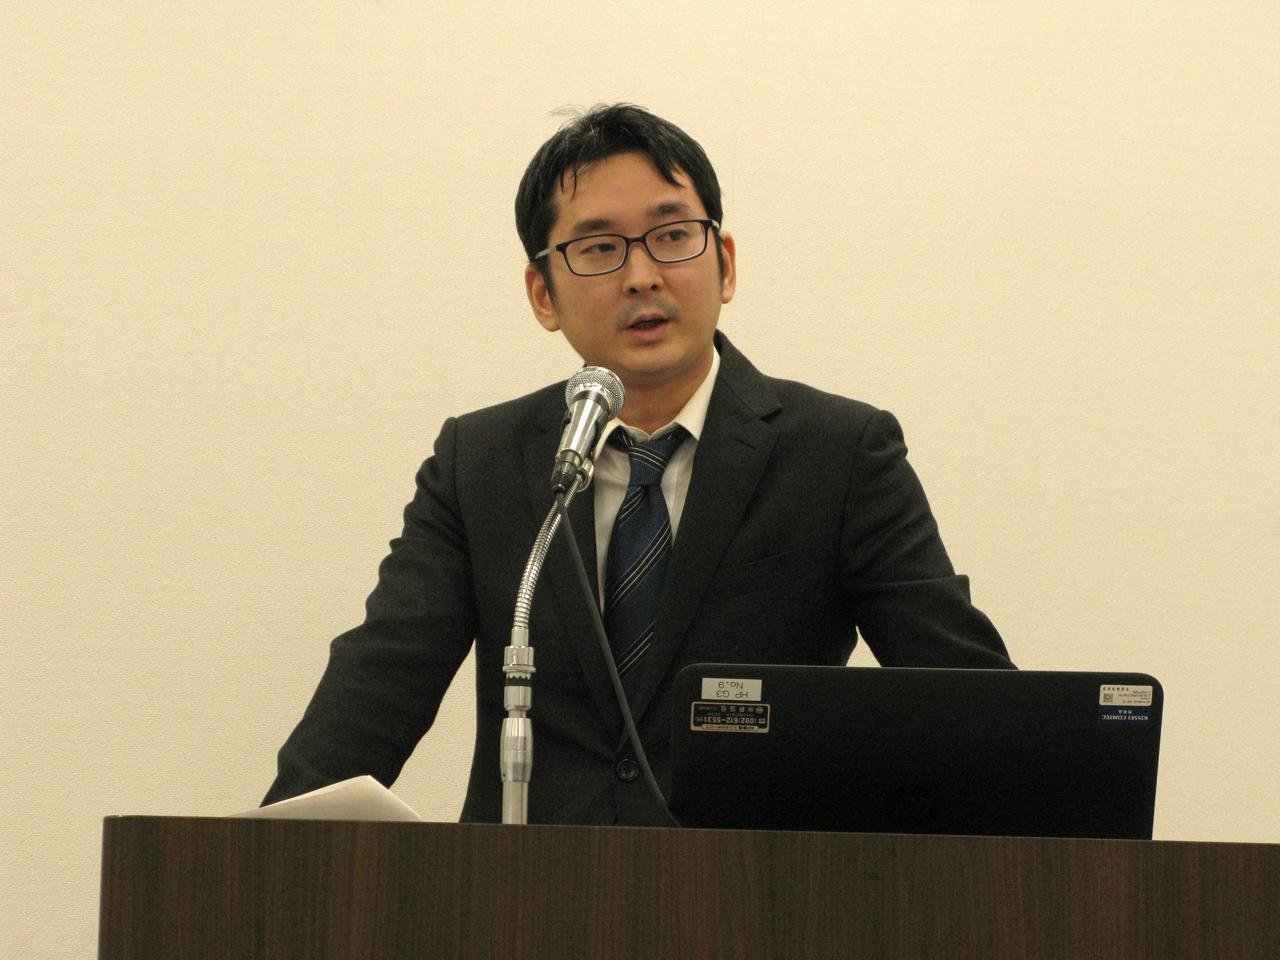 伊藤亜聖氏(福岡ユネスコアジア文化講演会)